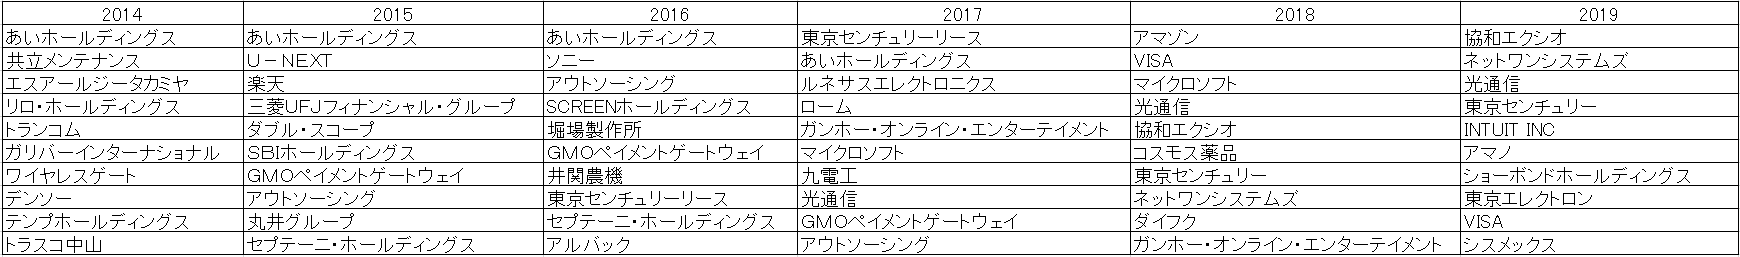 hifumi-suii-20191002.png